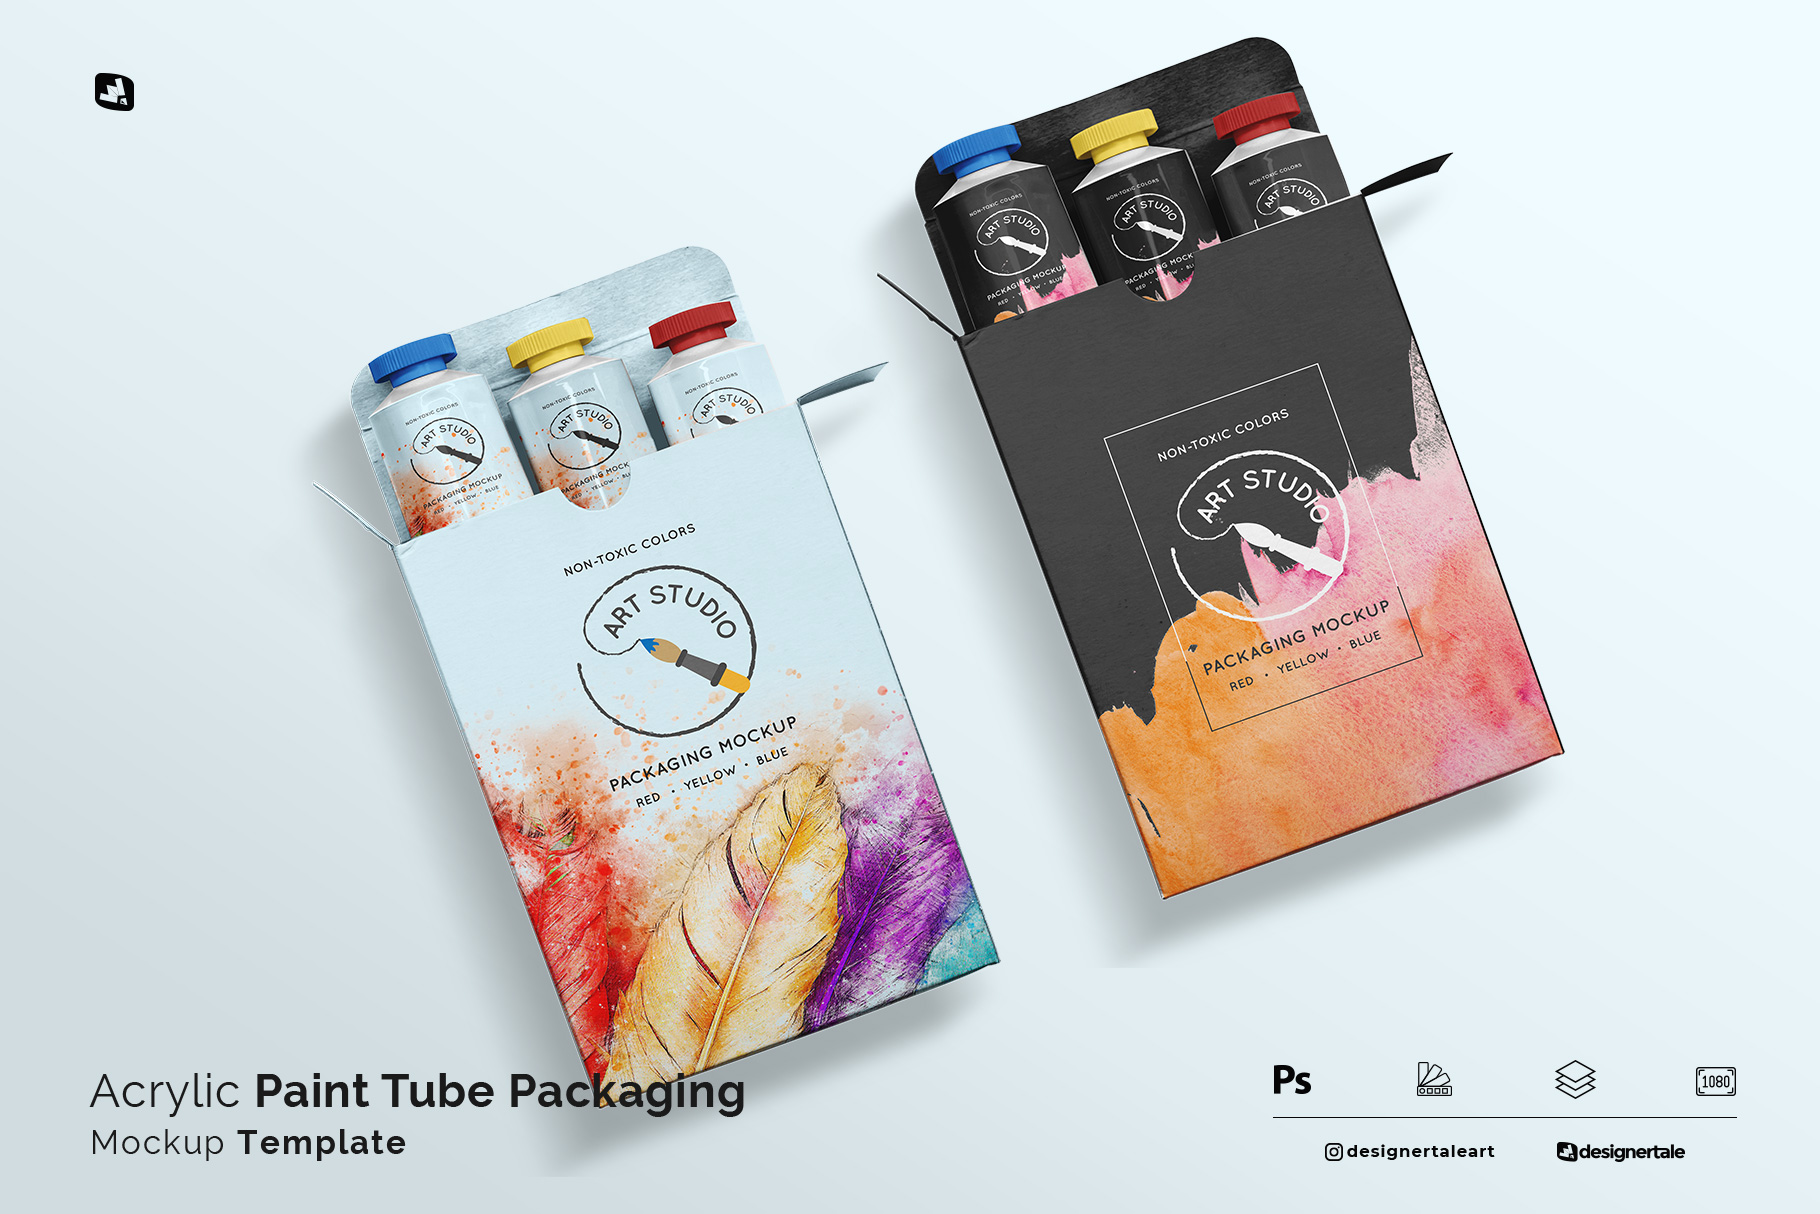 acrylic paint tube packaging mockup